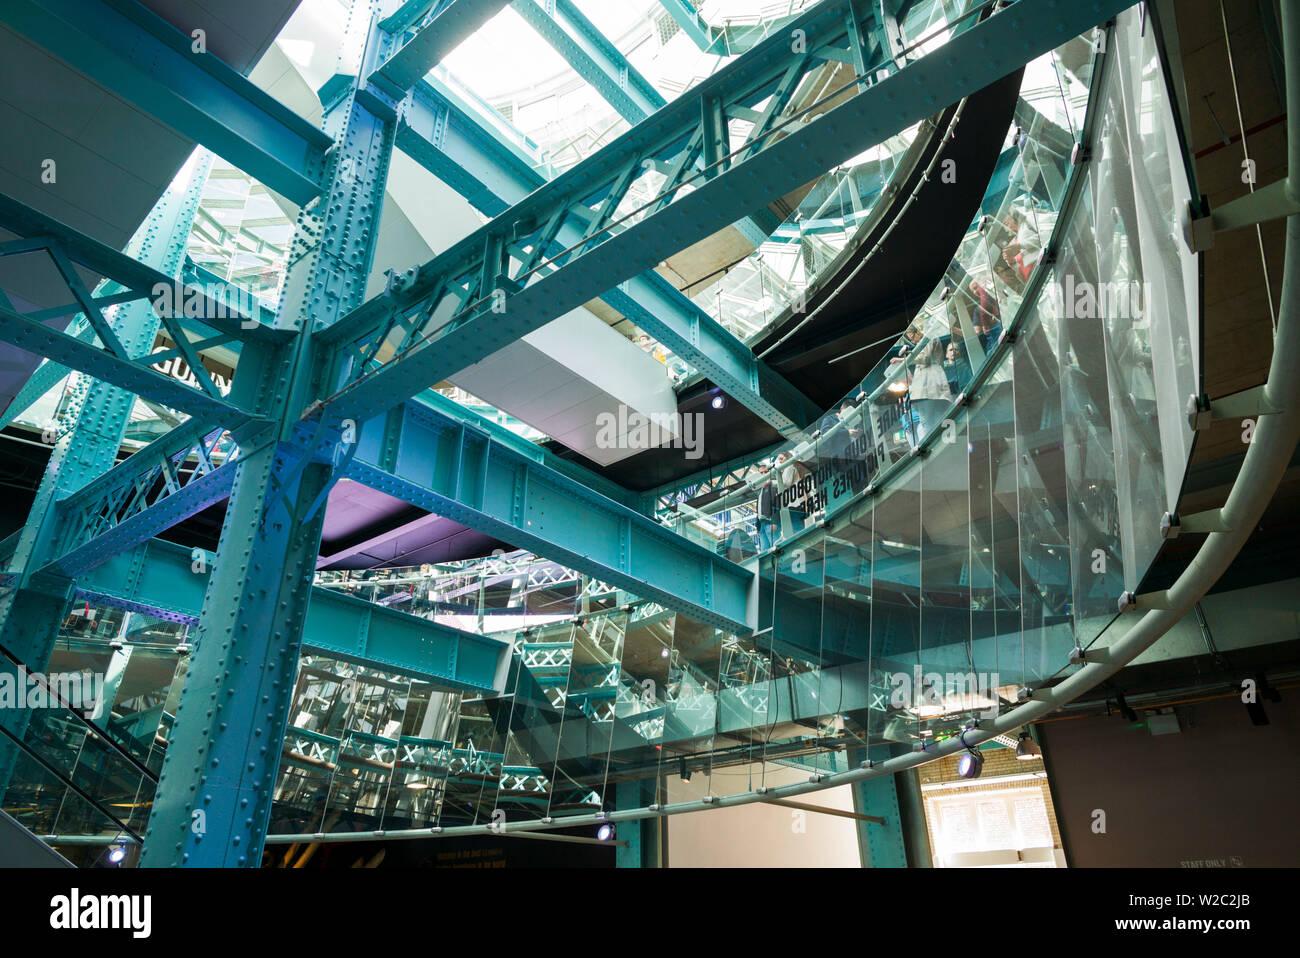 Ireland, Dublin, Guiness Storehouse, brewery museum, interior - Stock Image